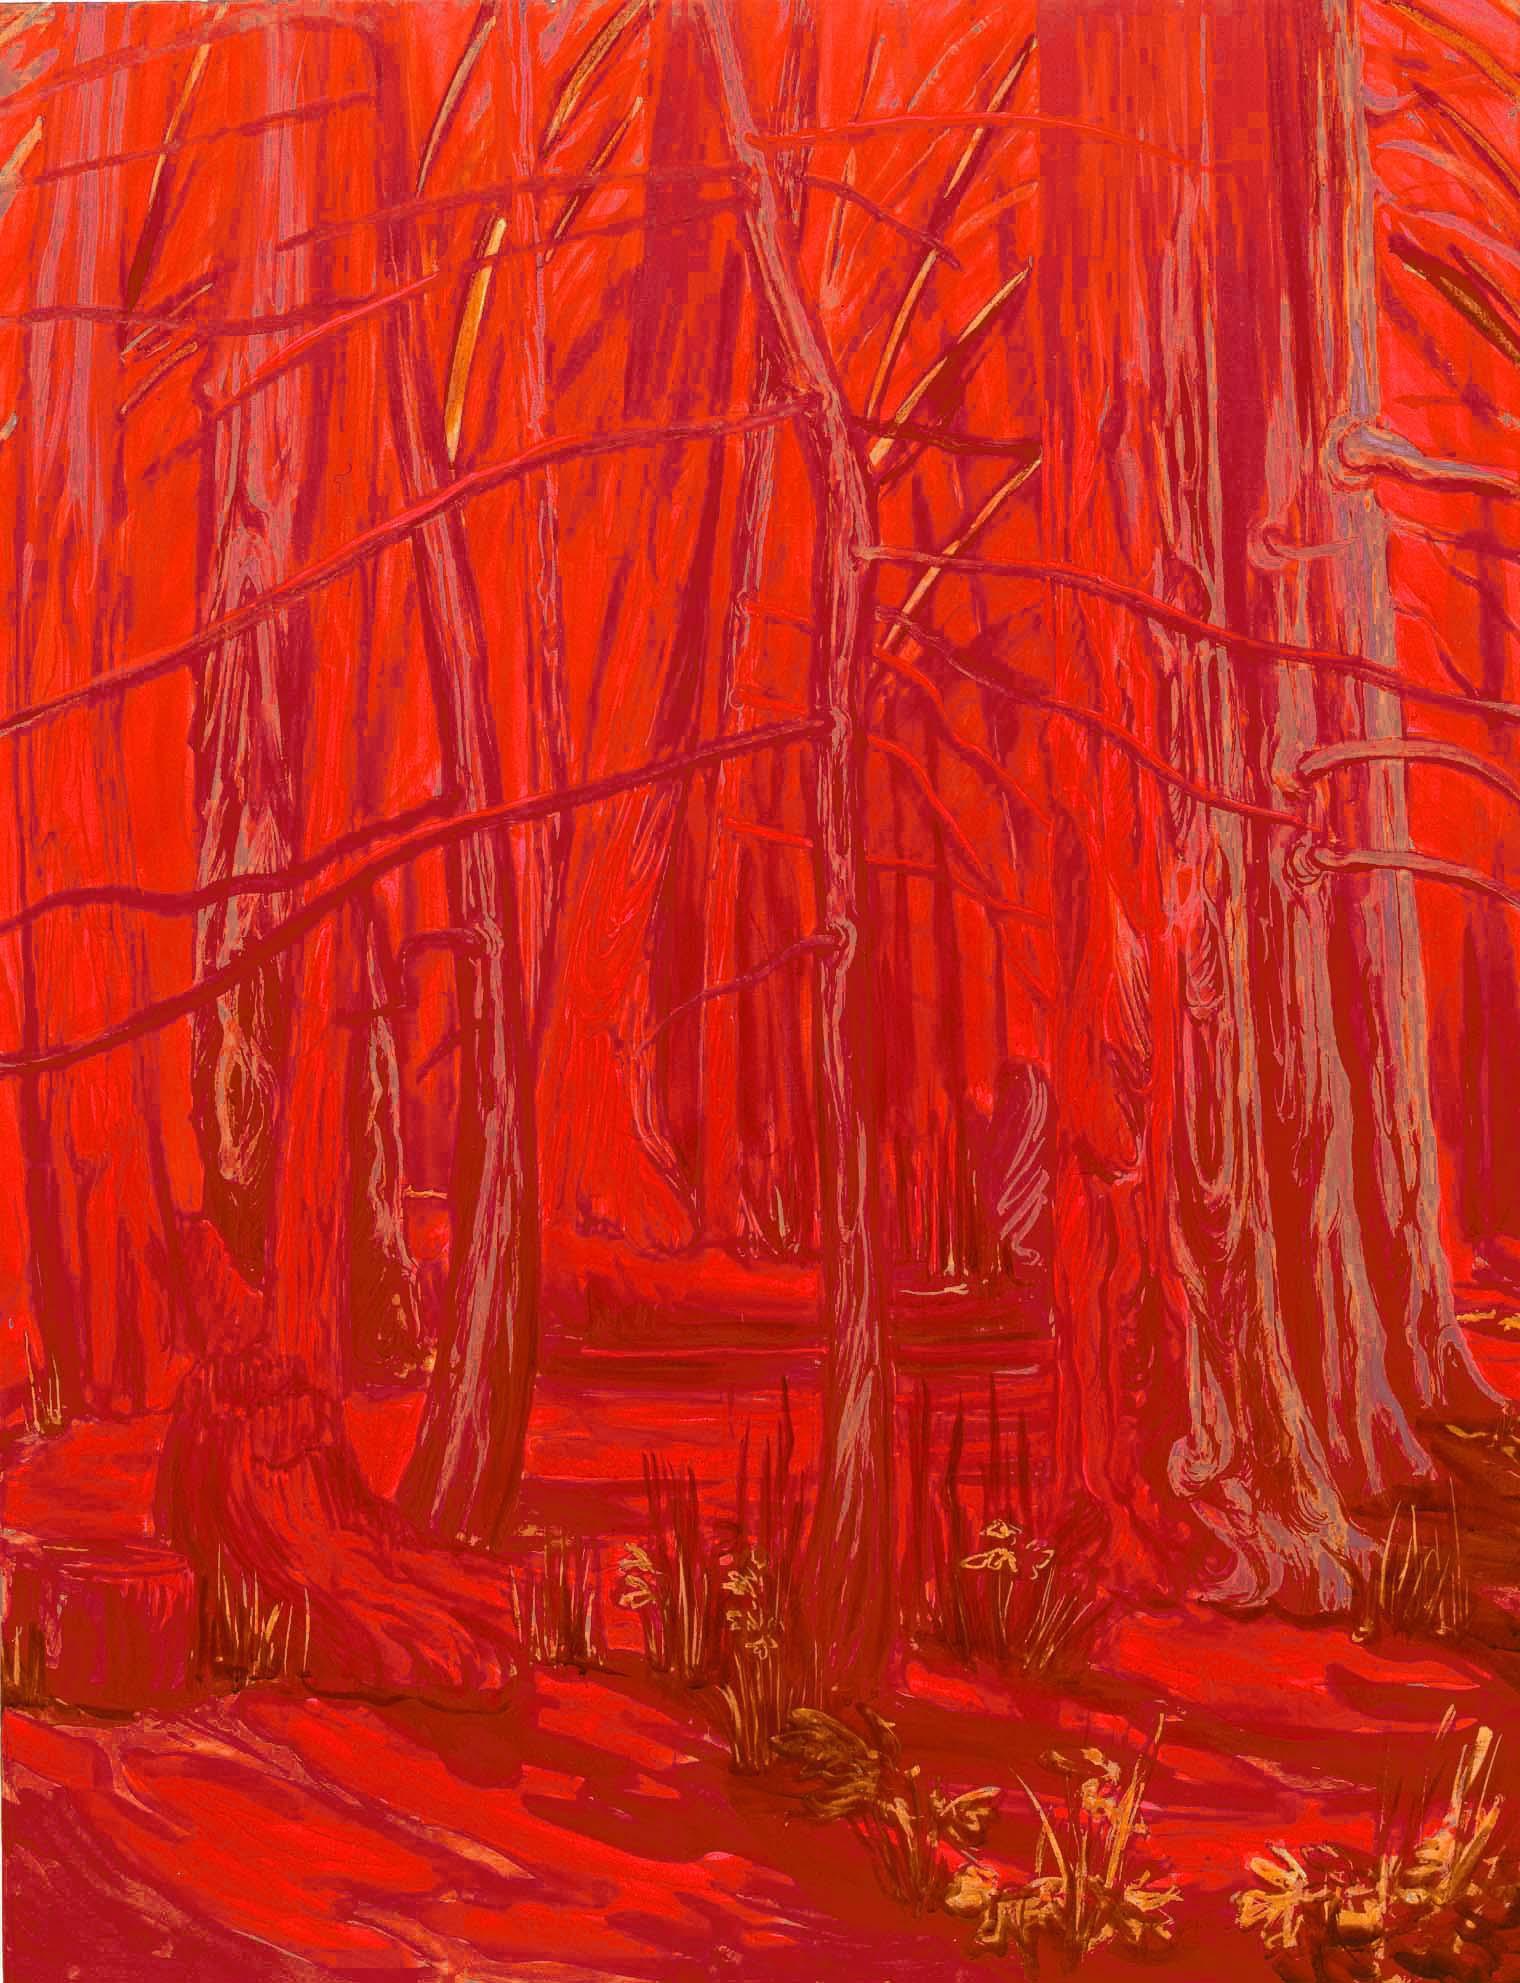 Redwood grove at Morningstar, 2008